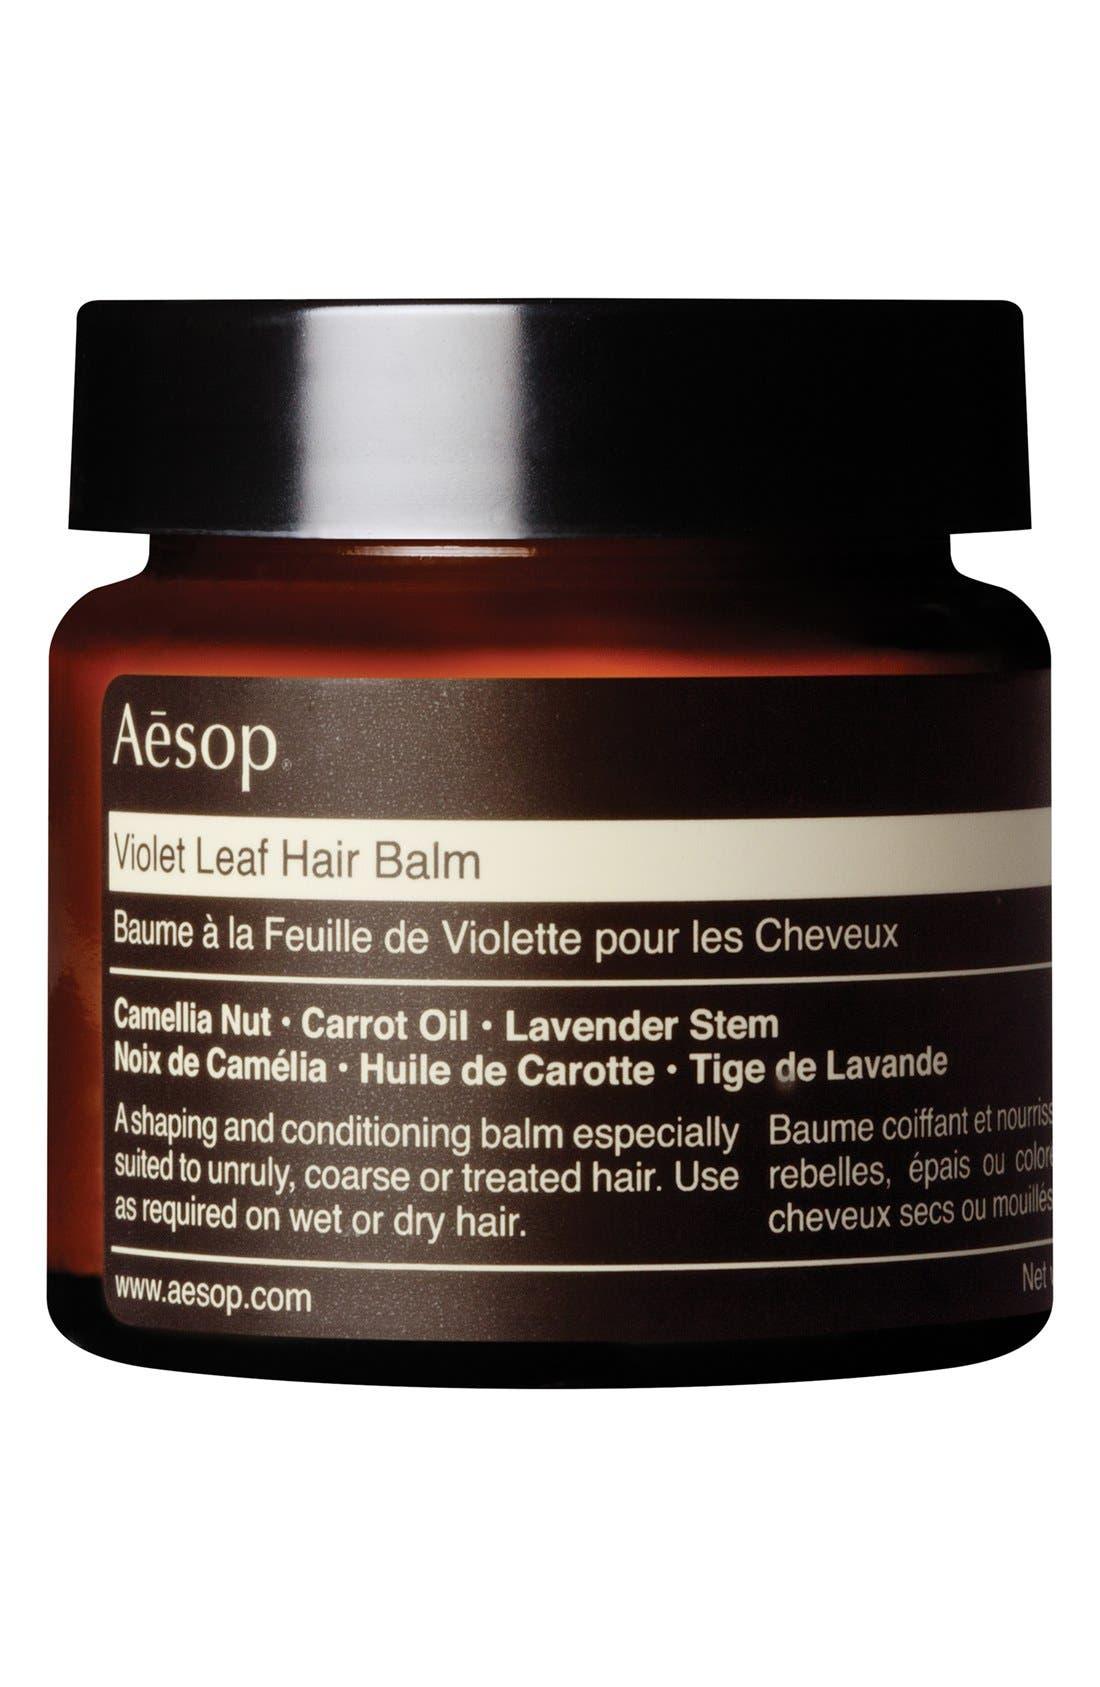 Aesop Violet Leaf Hair Balm